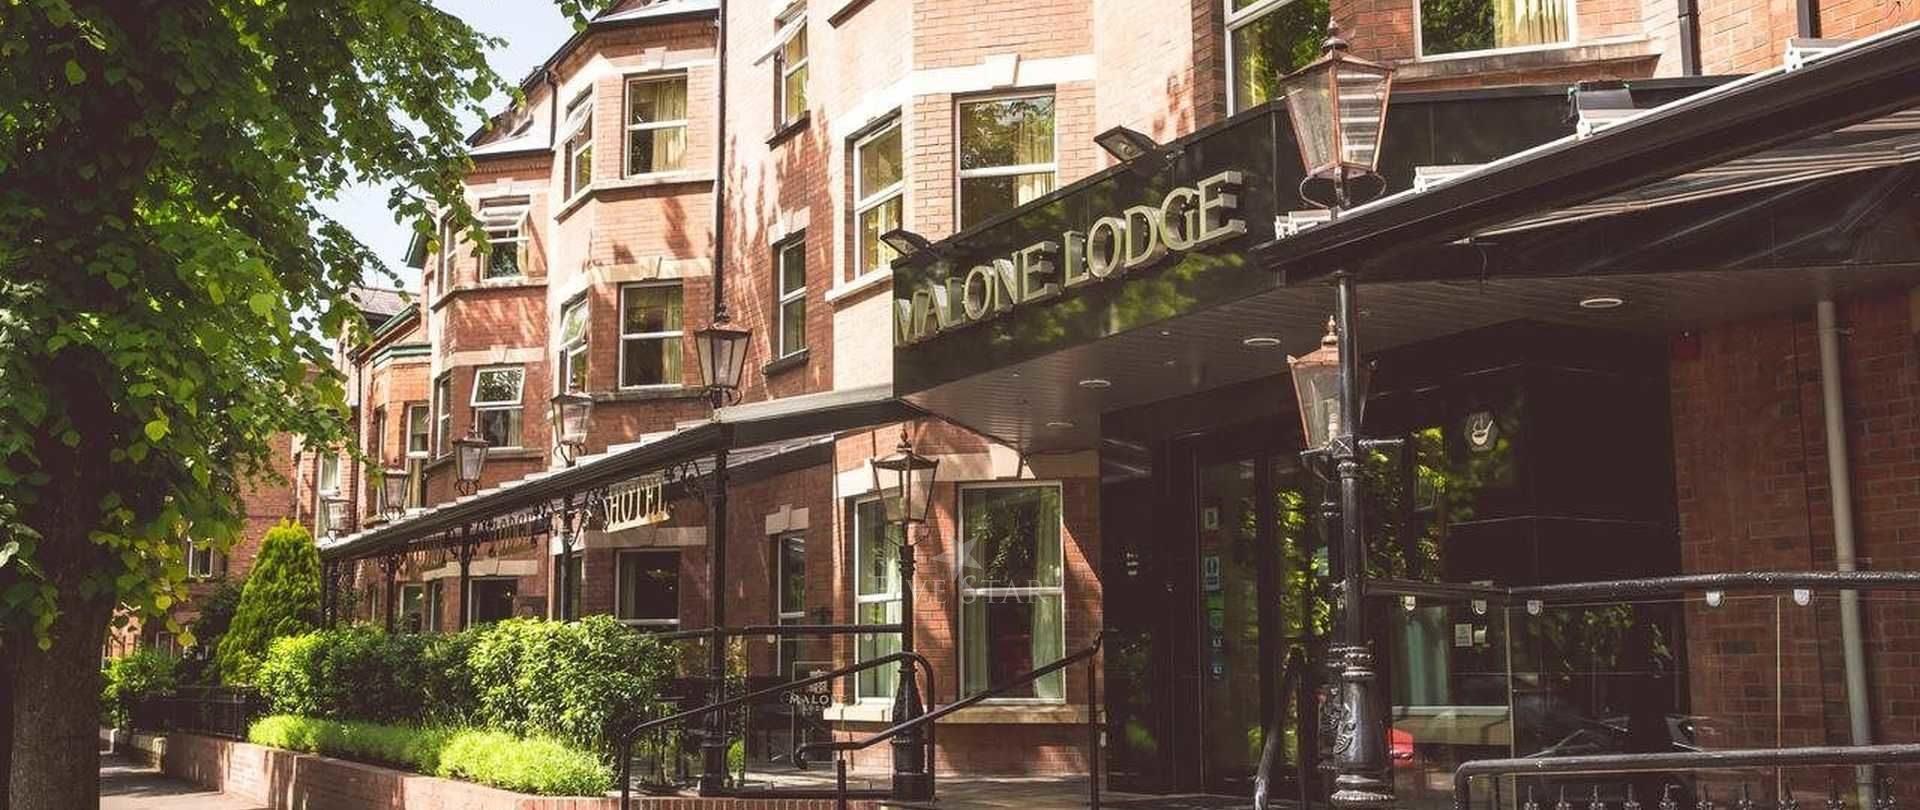 Malone Lodge Hotel & Apartments photo 7